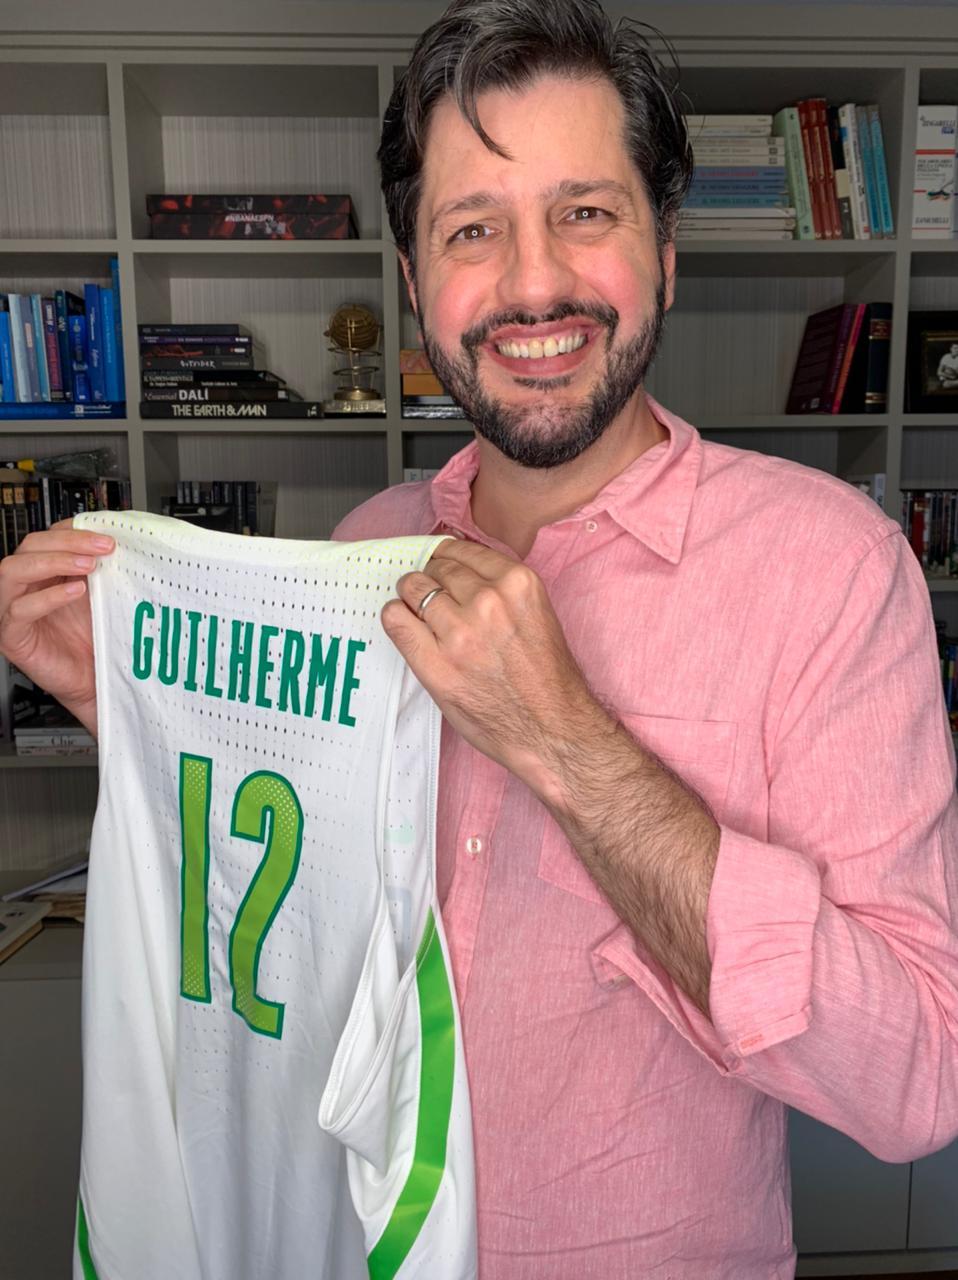 GuilhermeGiovannoni